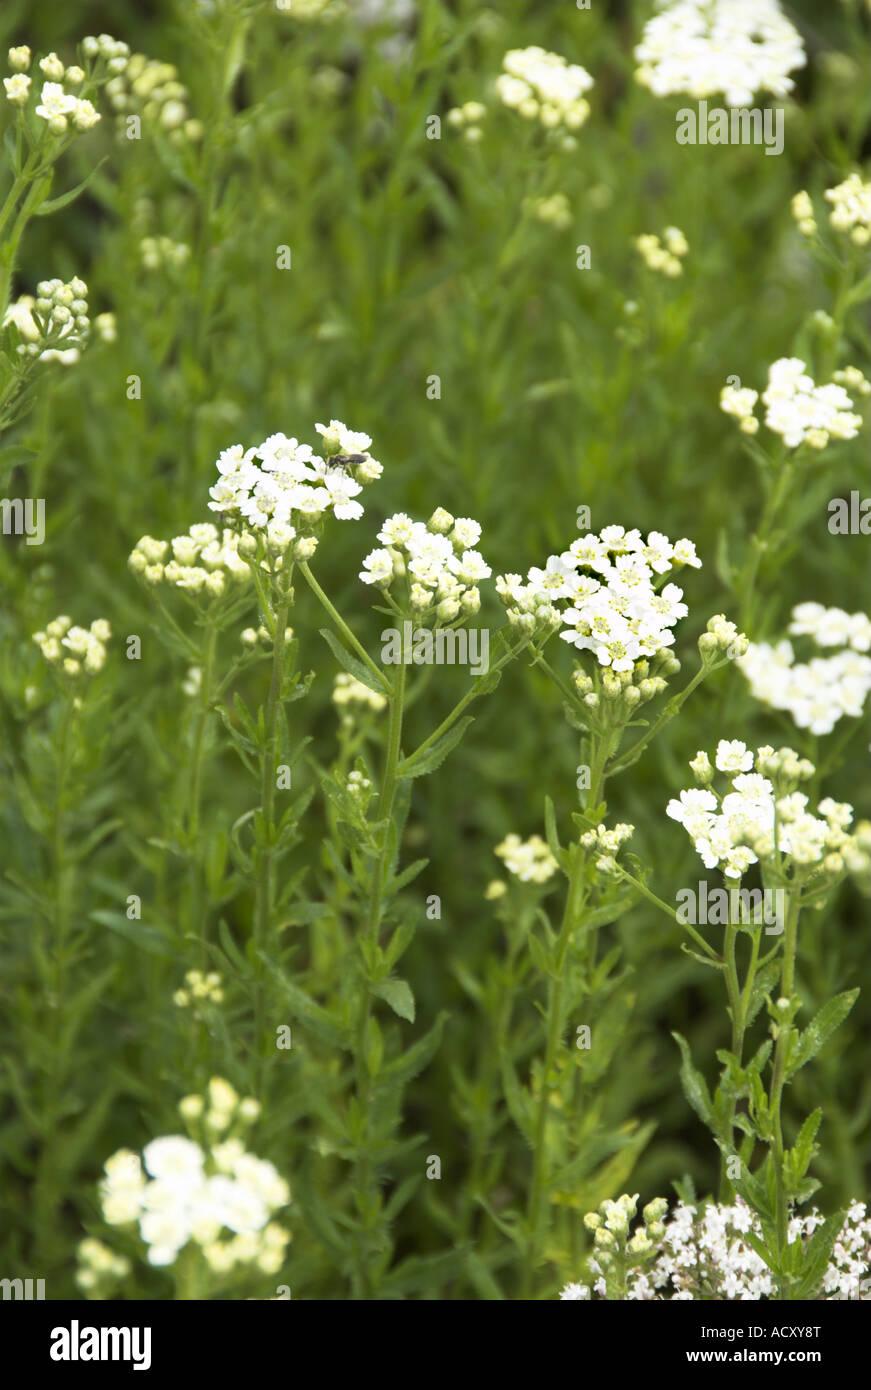 Herb English Mace achillea decolorans Stock Photo: 13249367